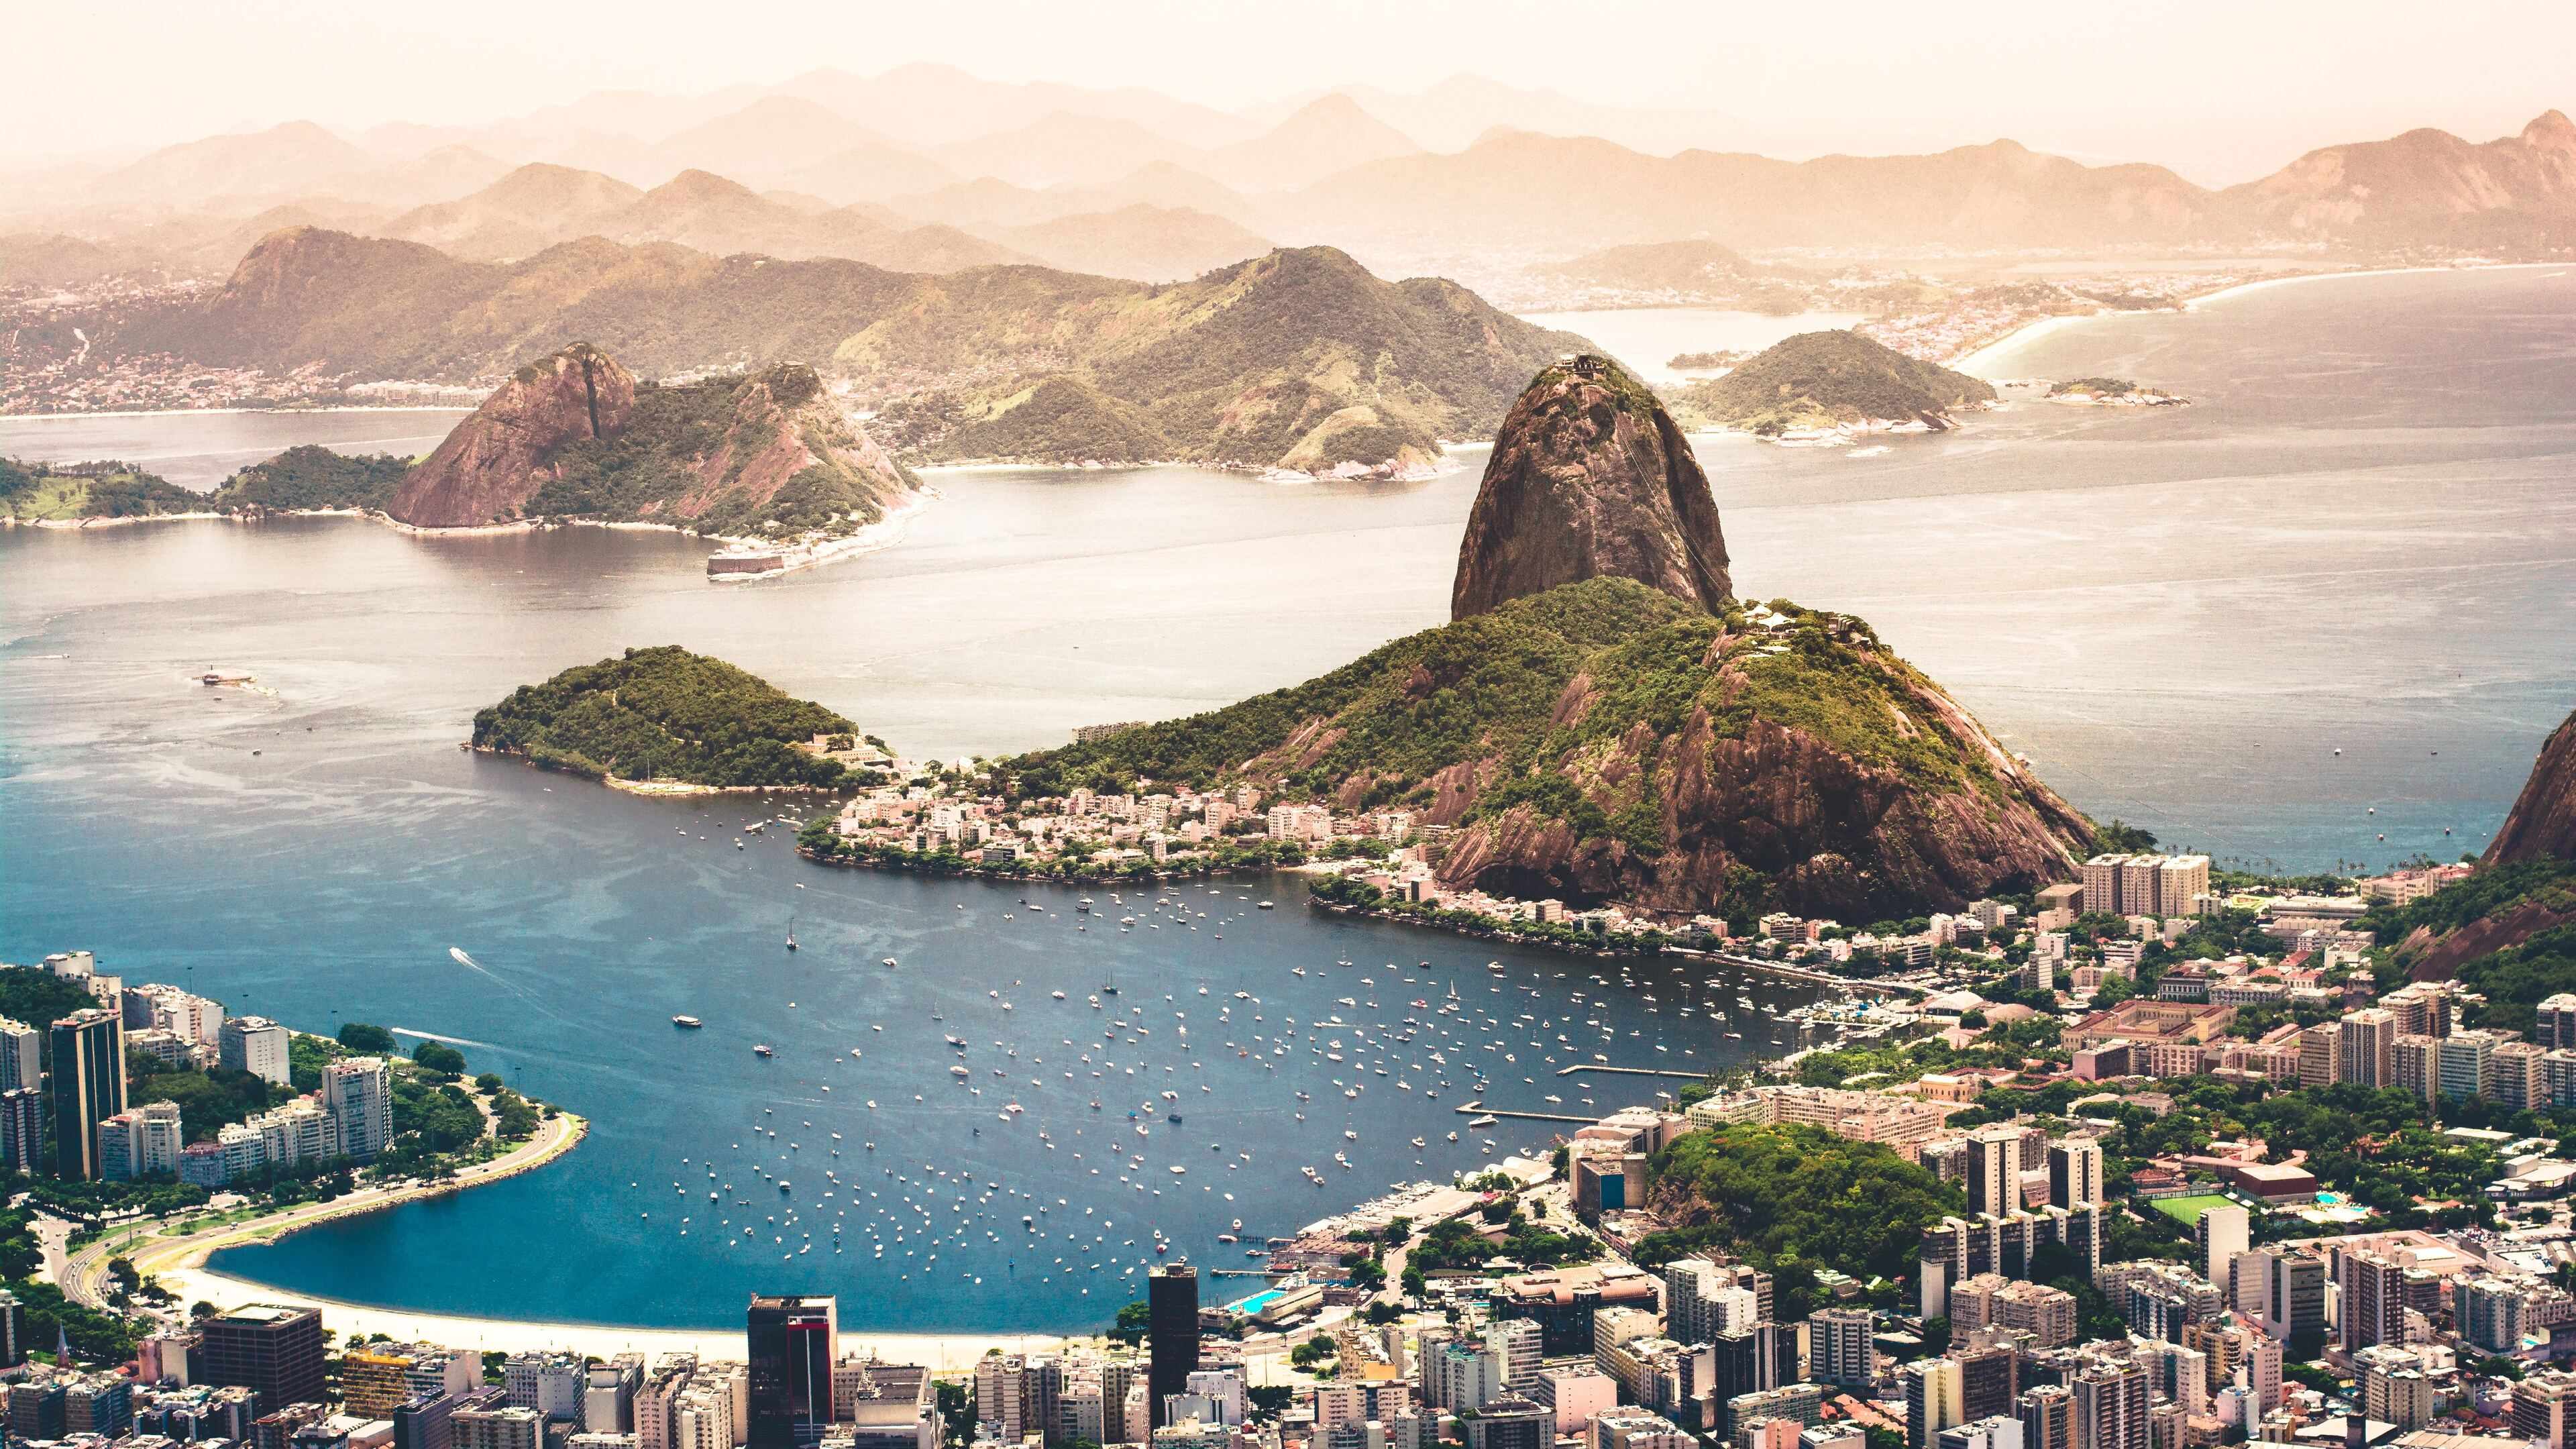 3840x2160 Rio De Janeiro Brazil 4k Hd 4k Wallpapers Images